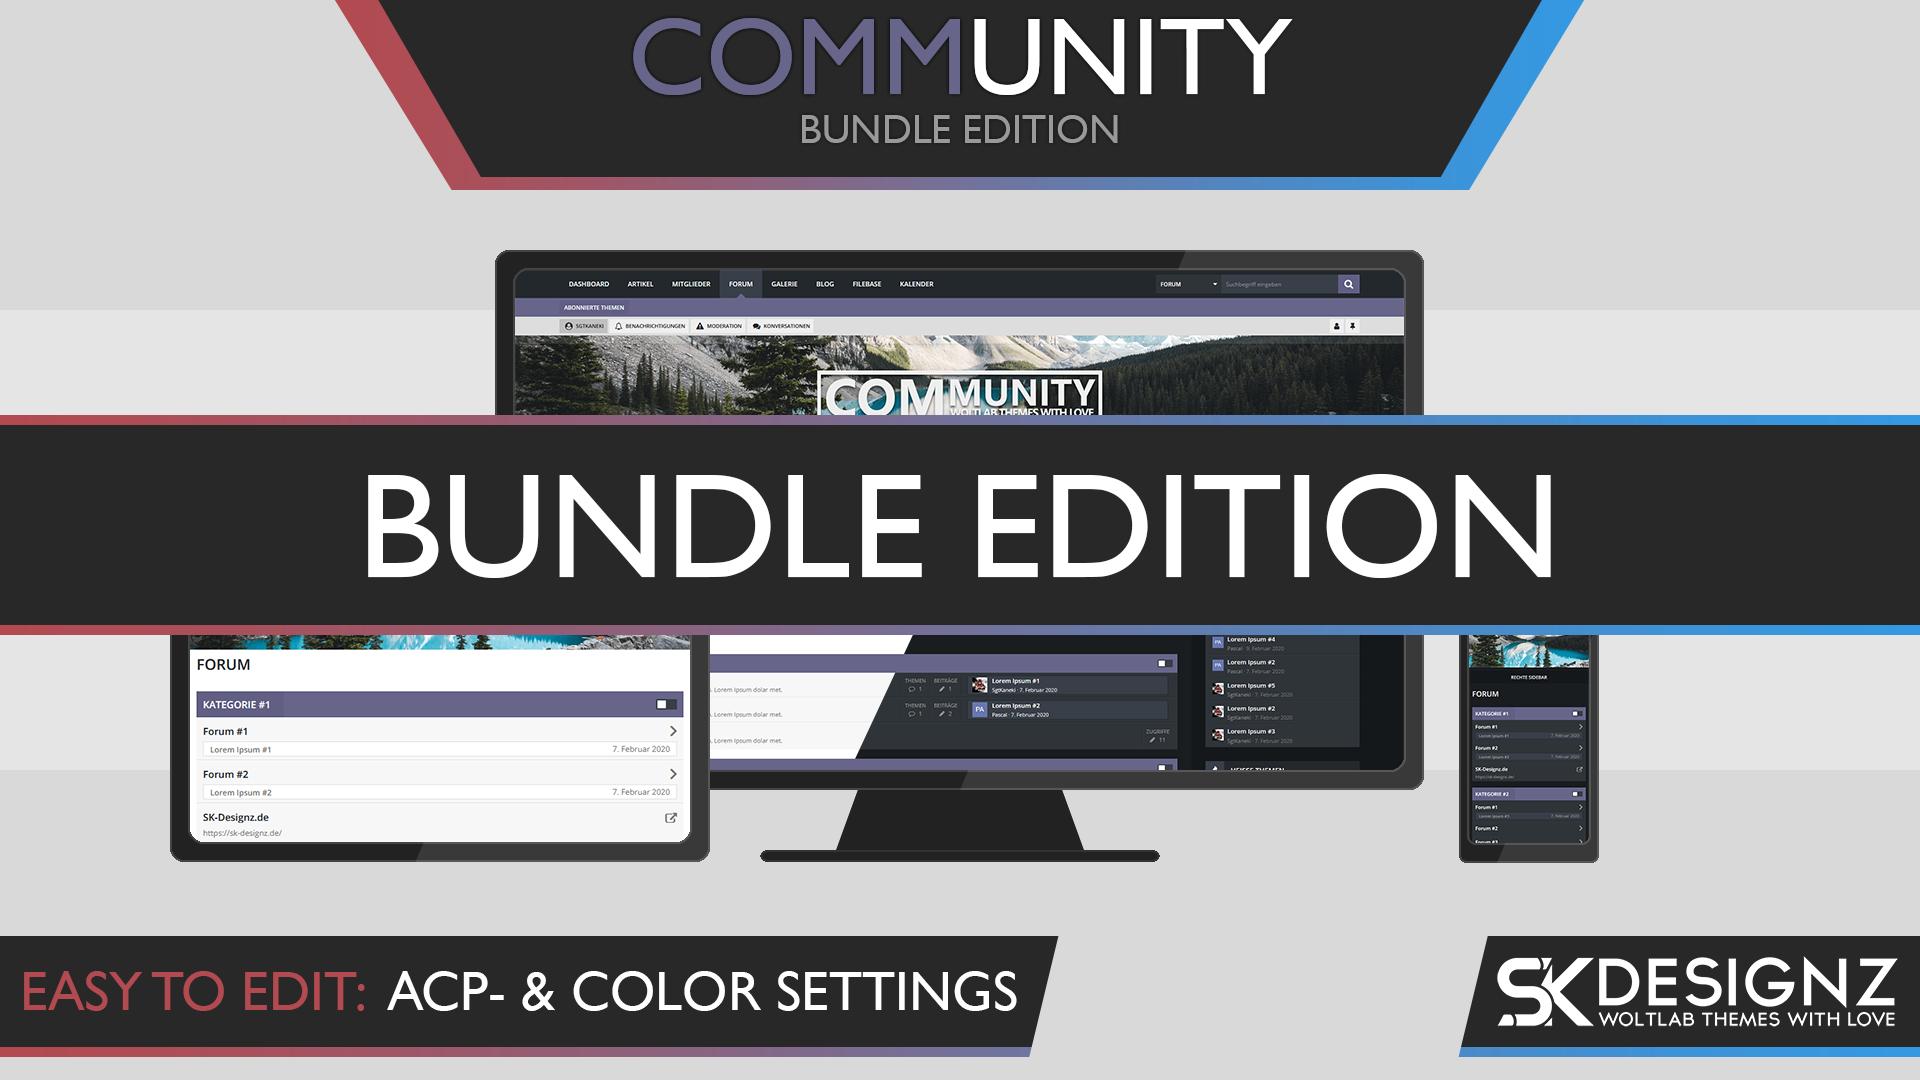 Community - Bundle Edition